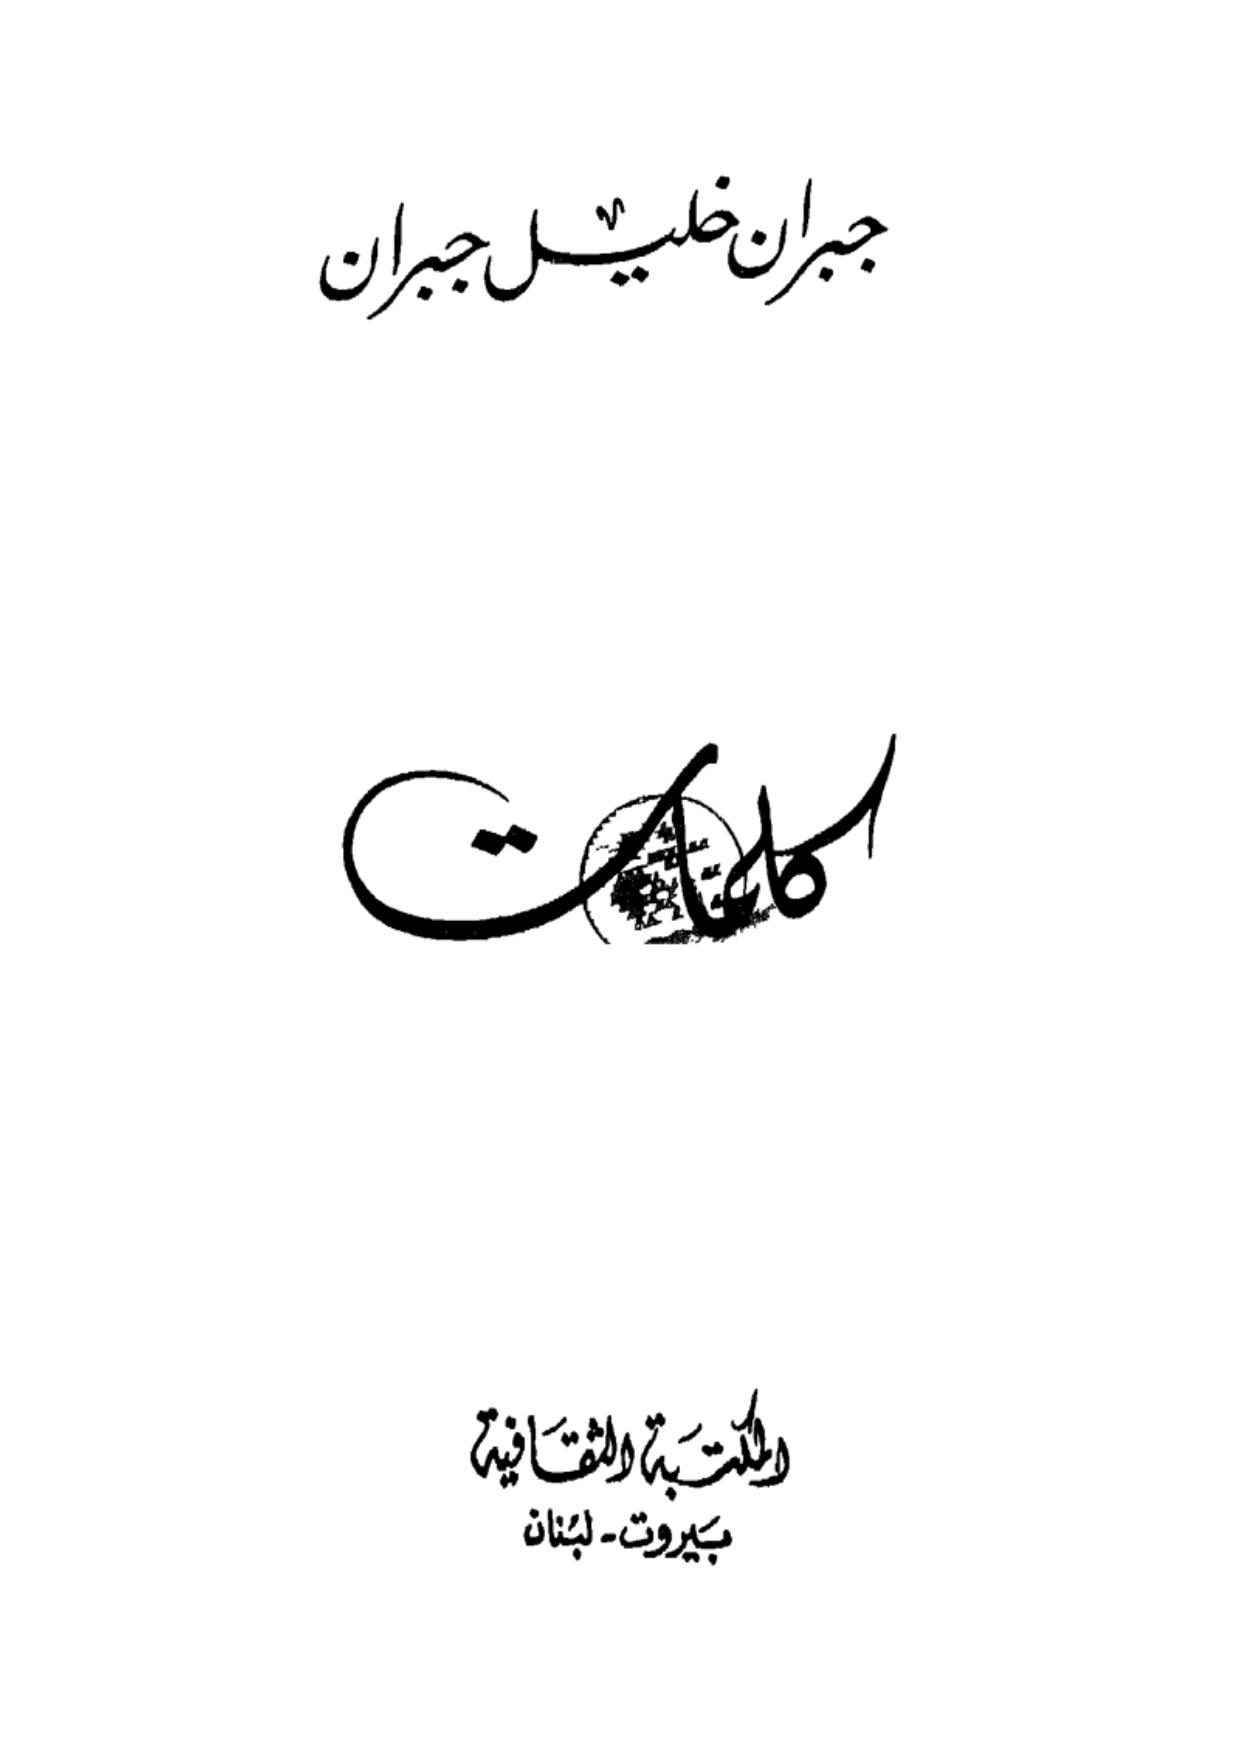 Kalimat Jubran, edited by Antonius Bashir, Beirut: al-Maktabat al-Thaqafia, n.d. [1st edition: al-Qahirah: Yusuf Bustani, 1927].